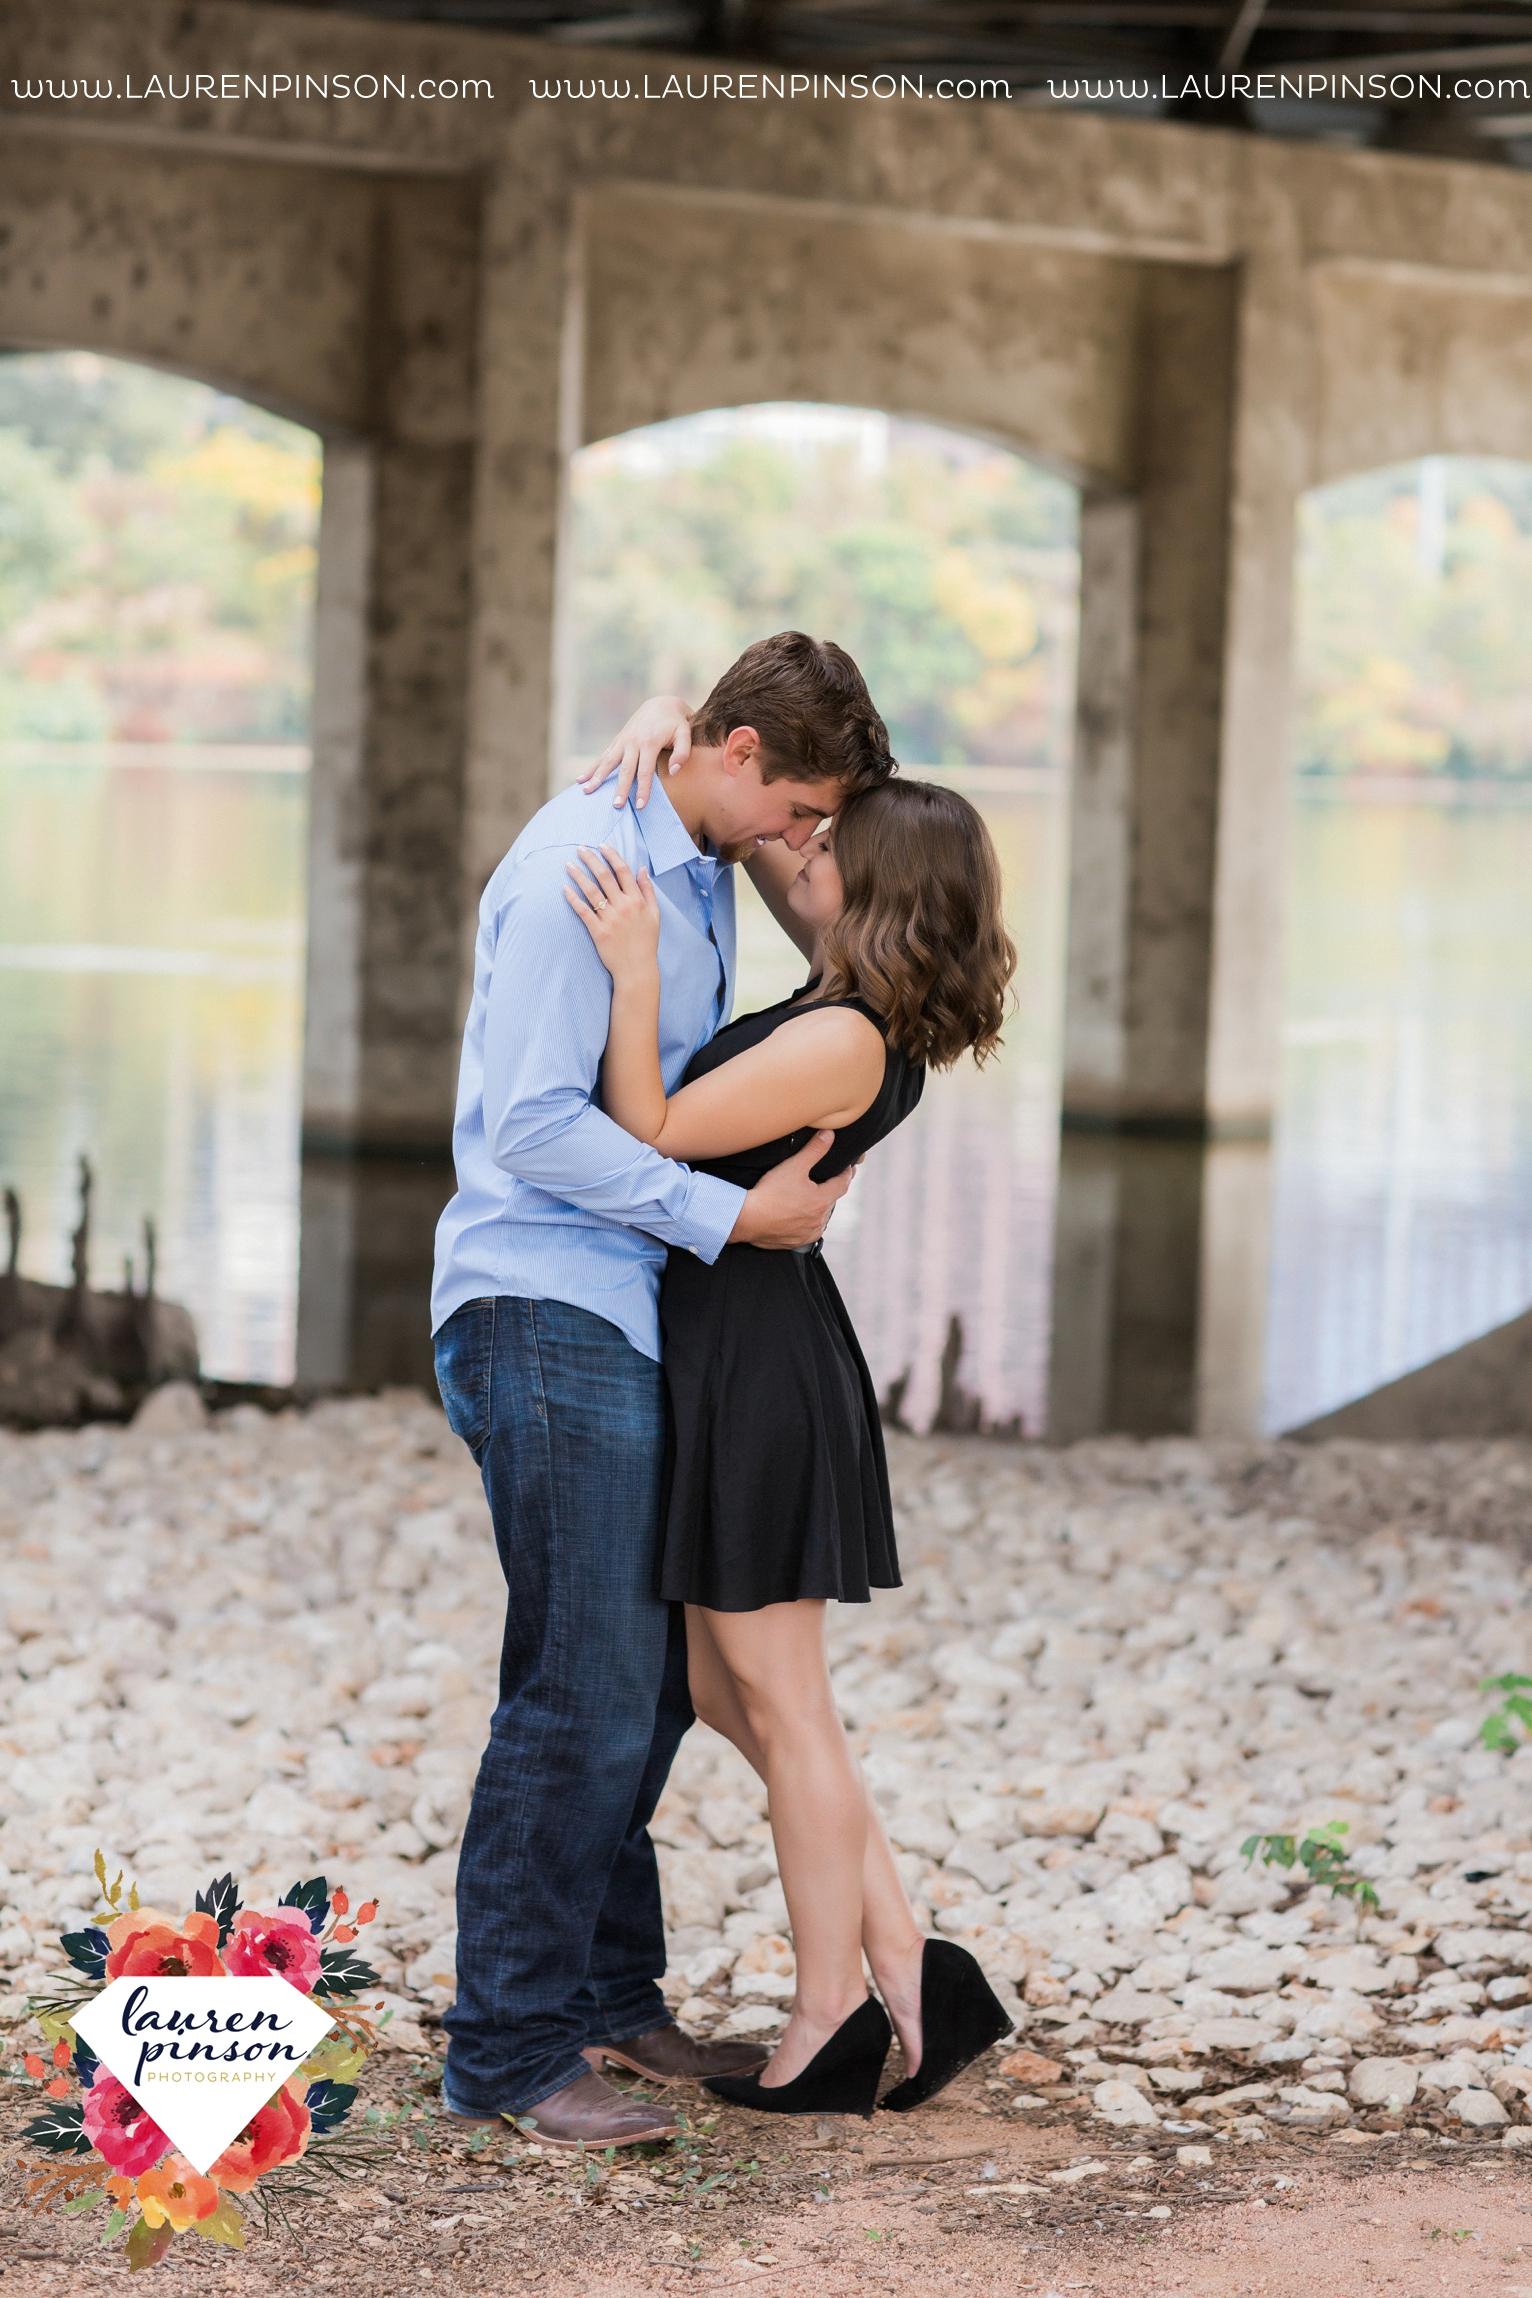 austin-texas-engagement-session-photography-by-wichita-falls-wedding-photgraphy-lauren-pinson_1397.jpg